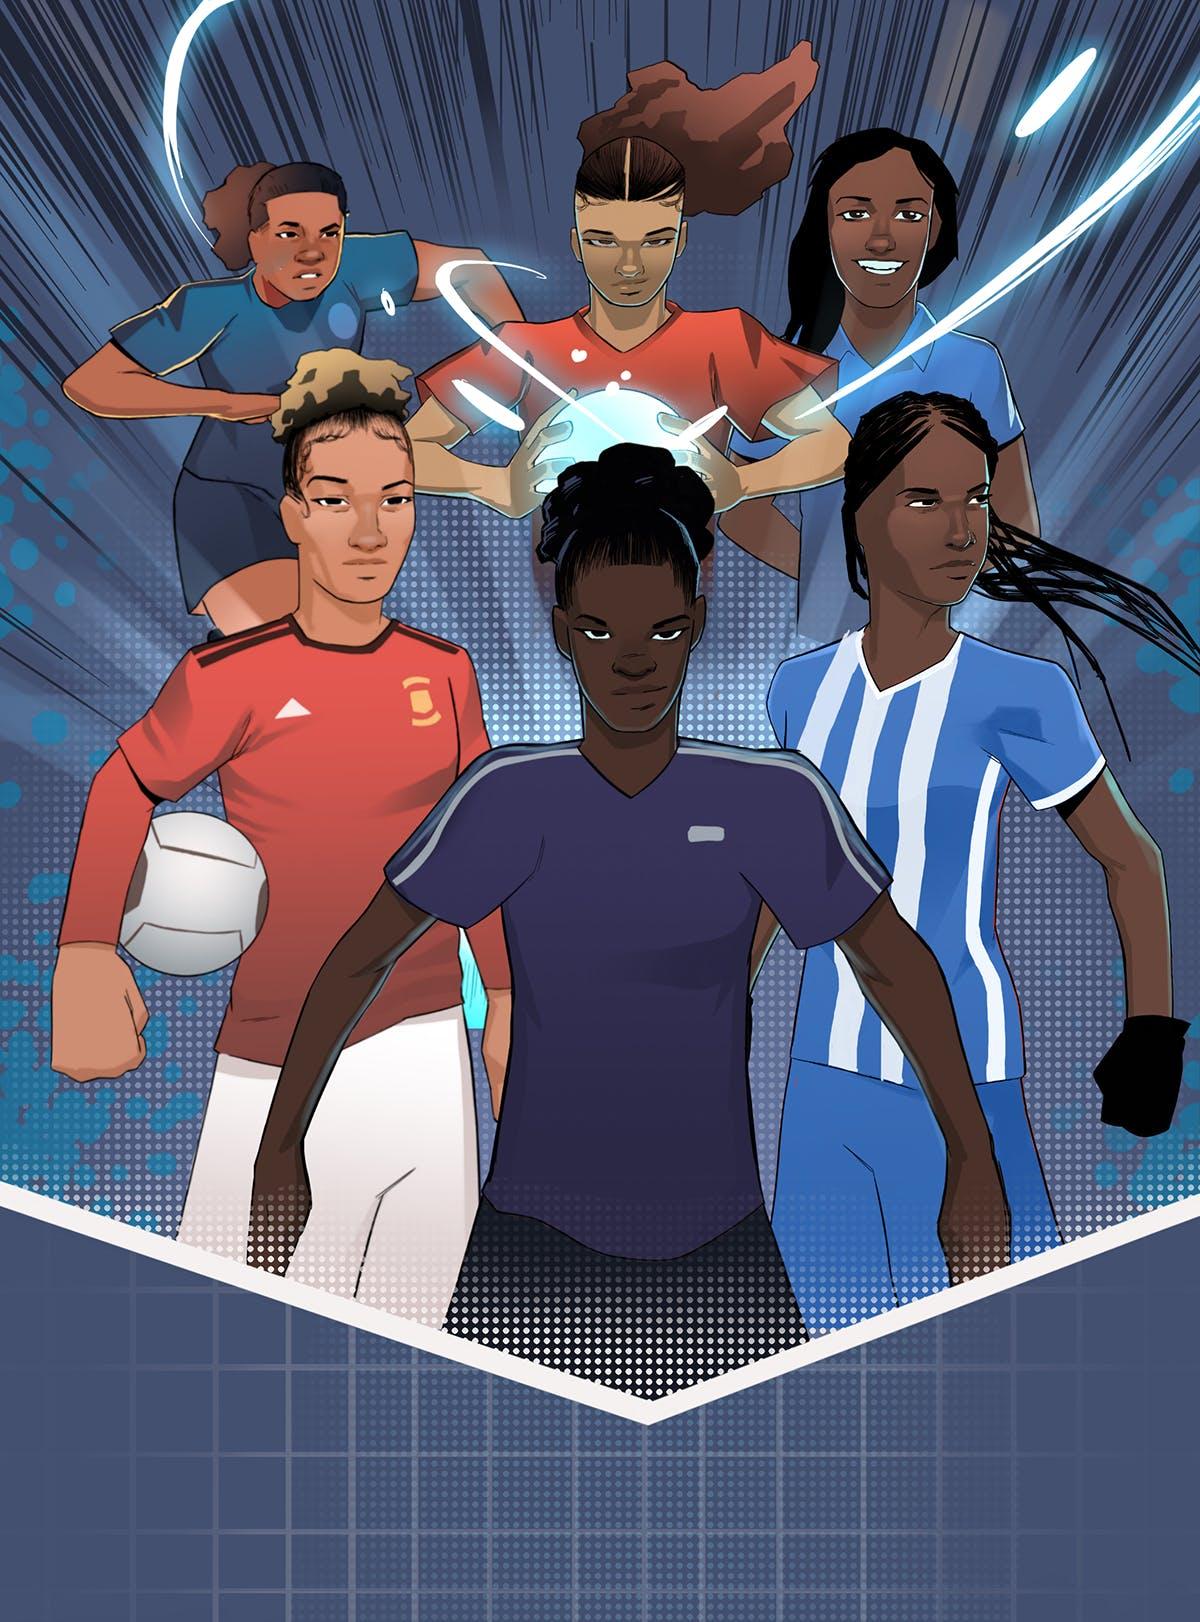 #Merky Books celebrates modern day superheroes through illustration -